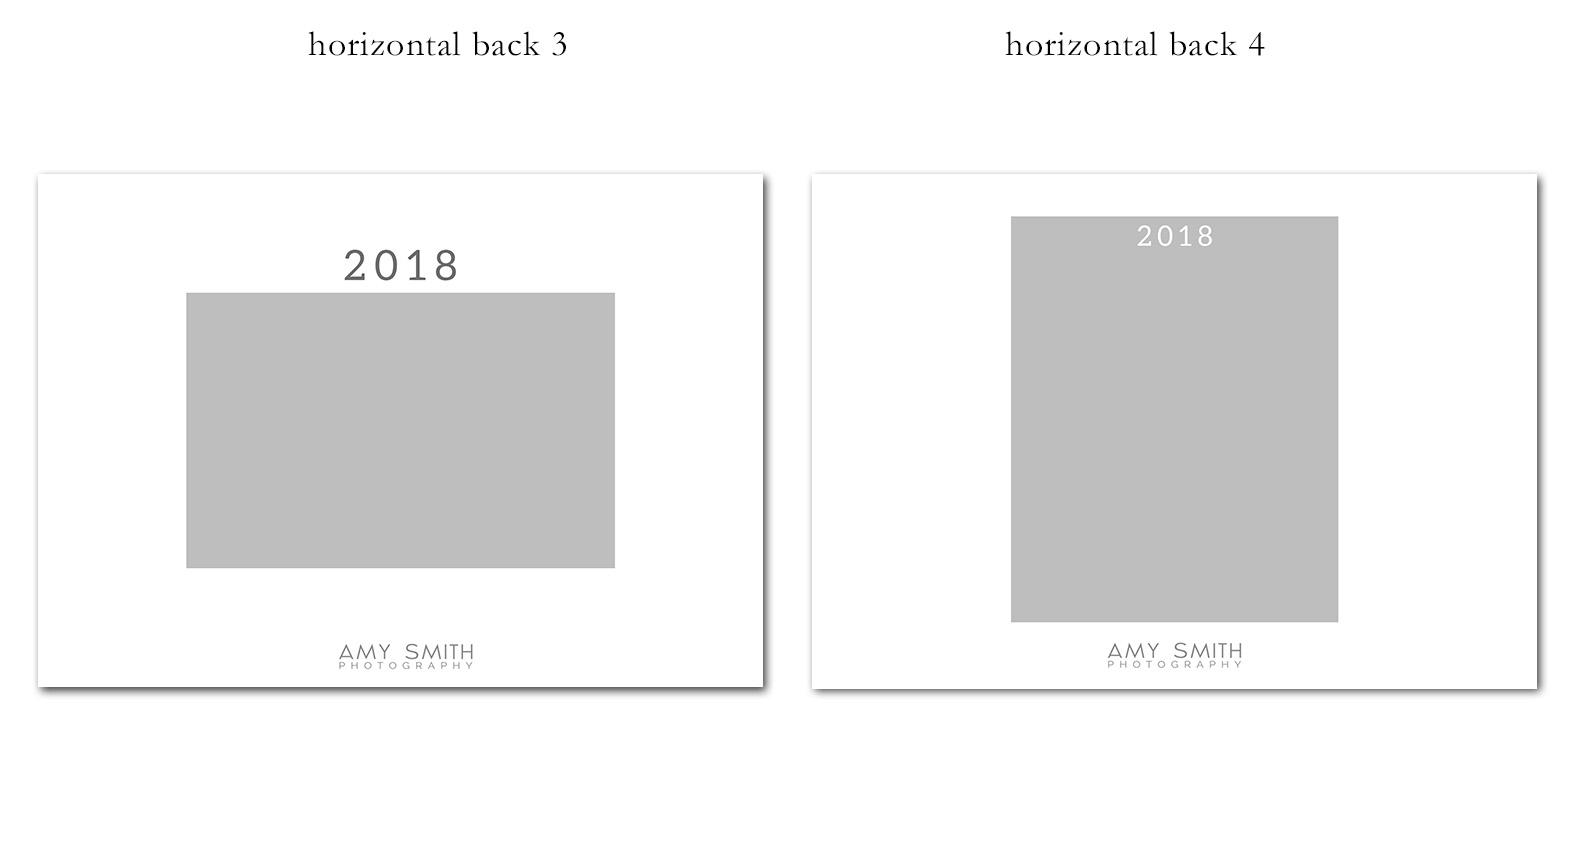 horizontalback34.jpg